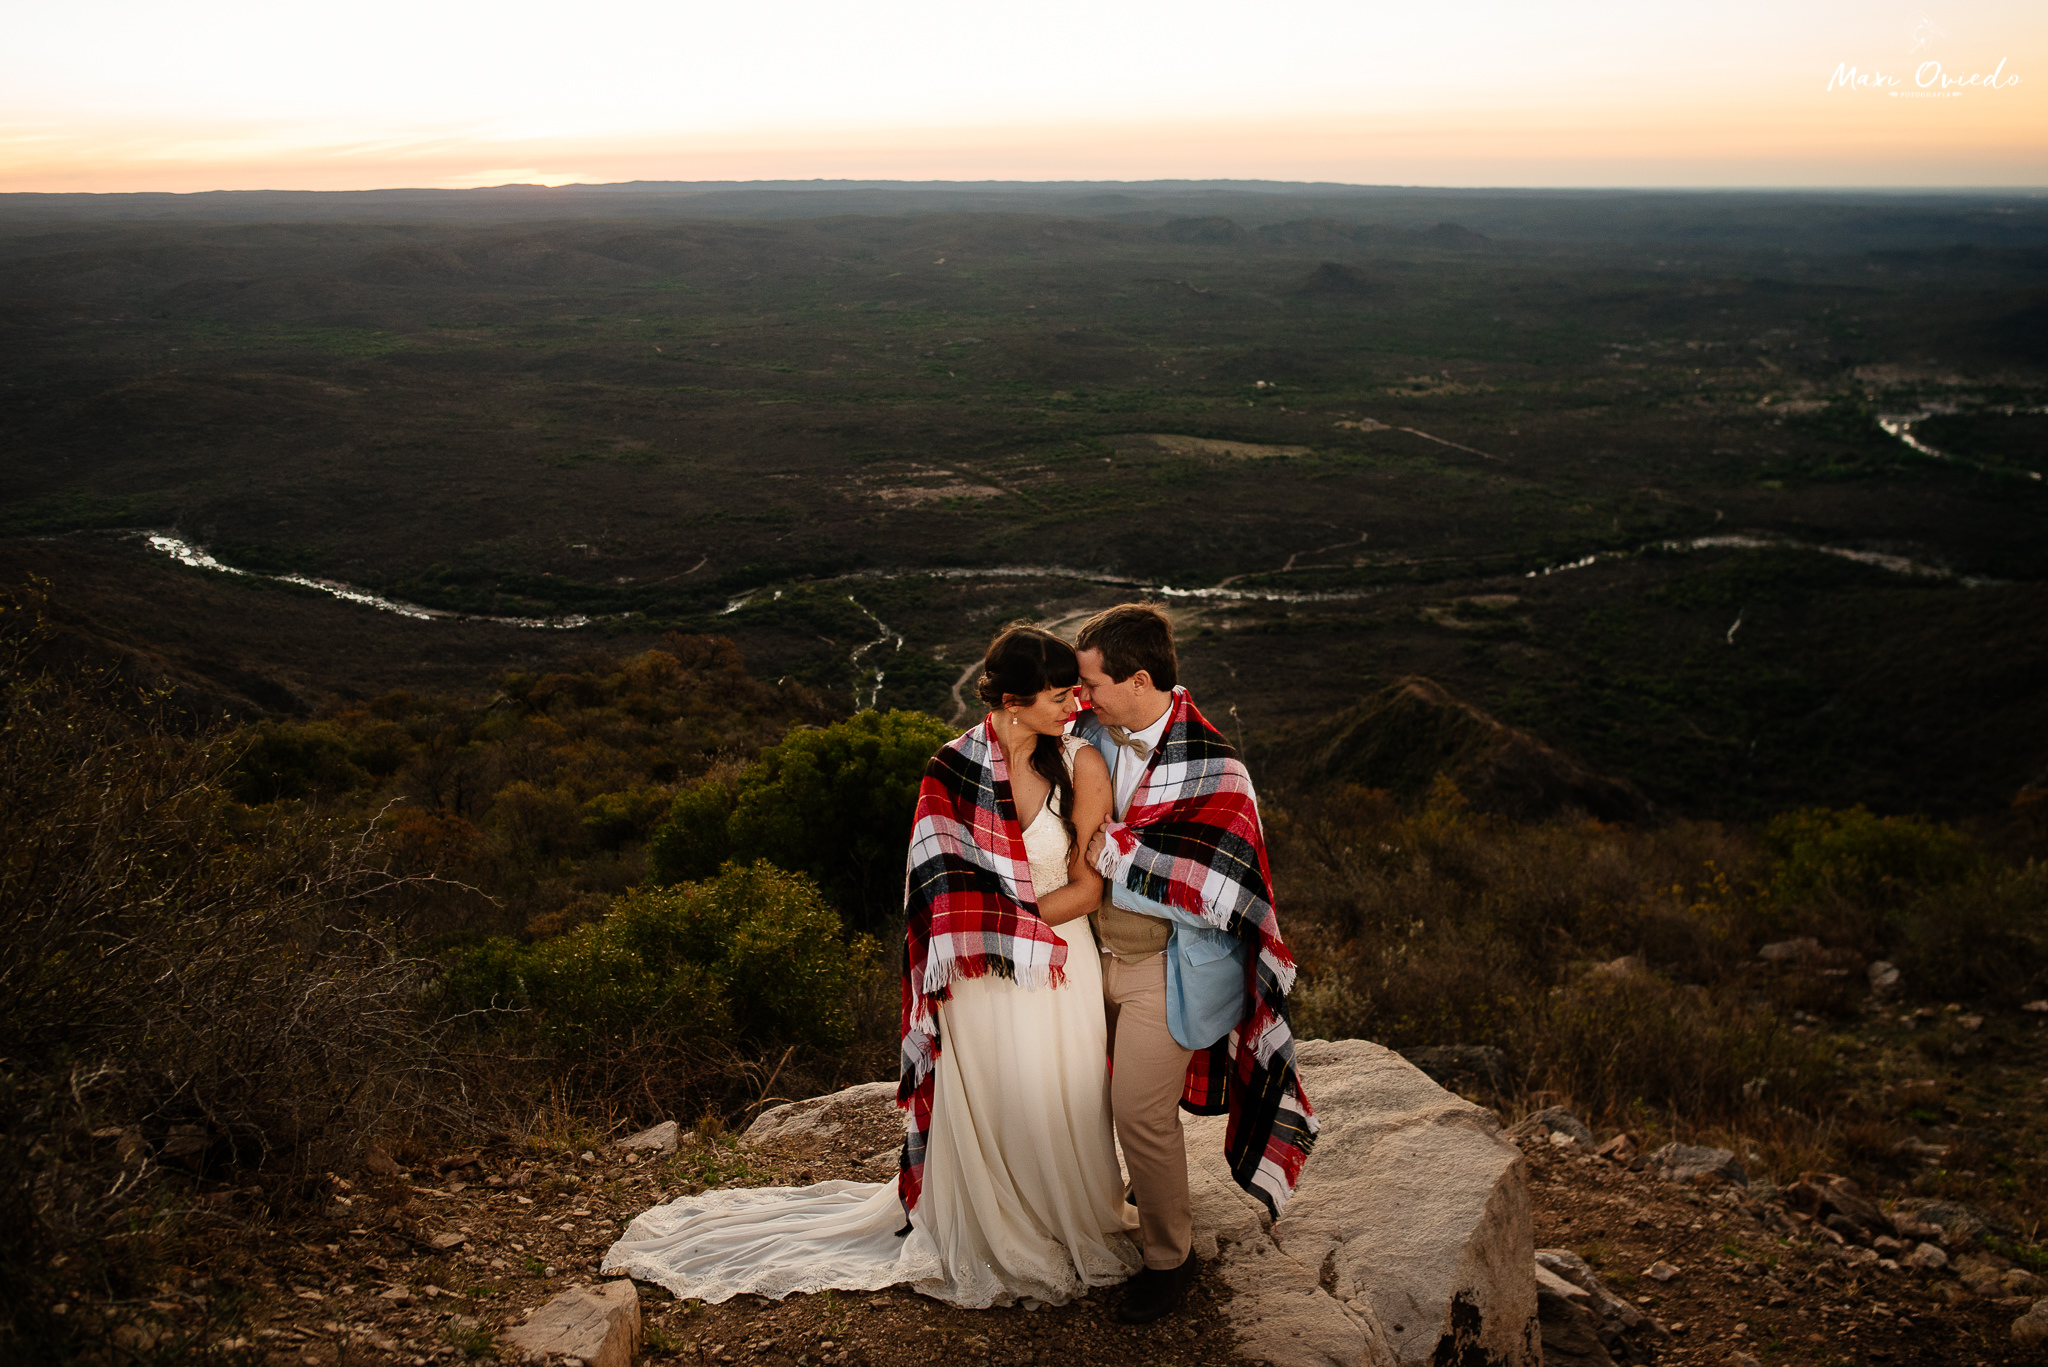 boda sextuple la cumbre cordoba cuchi corral fotografo de bodas fotografo de casamientos rosario san nicolas argentina vestido de novia ramo de novia-41.jpg